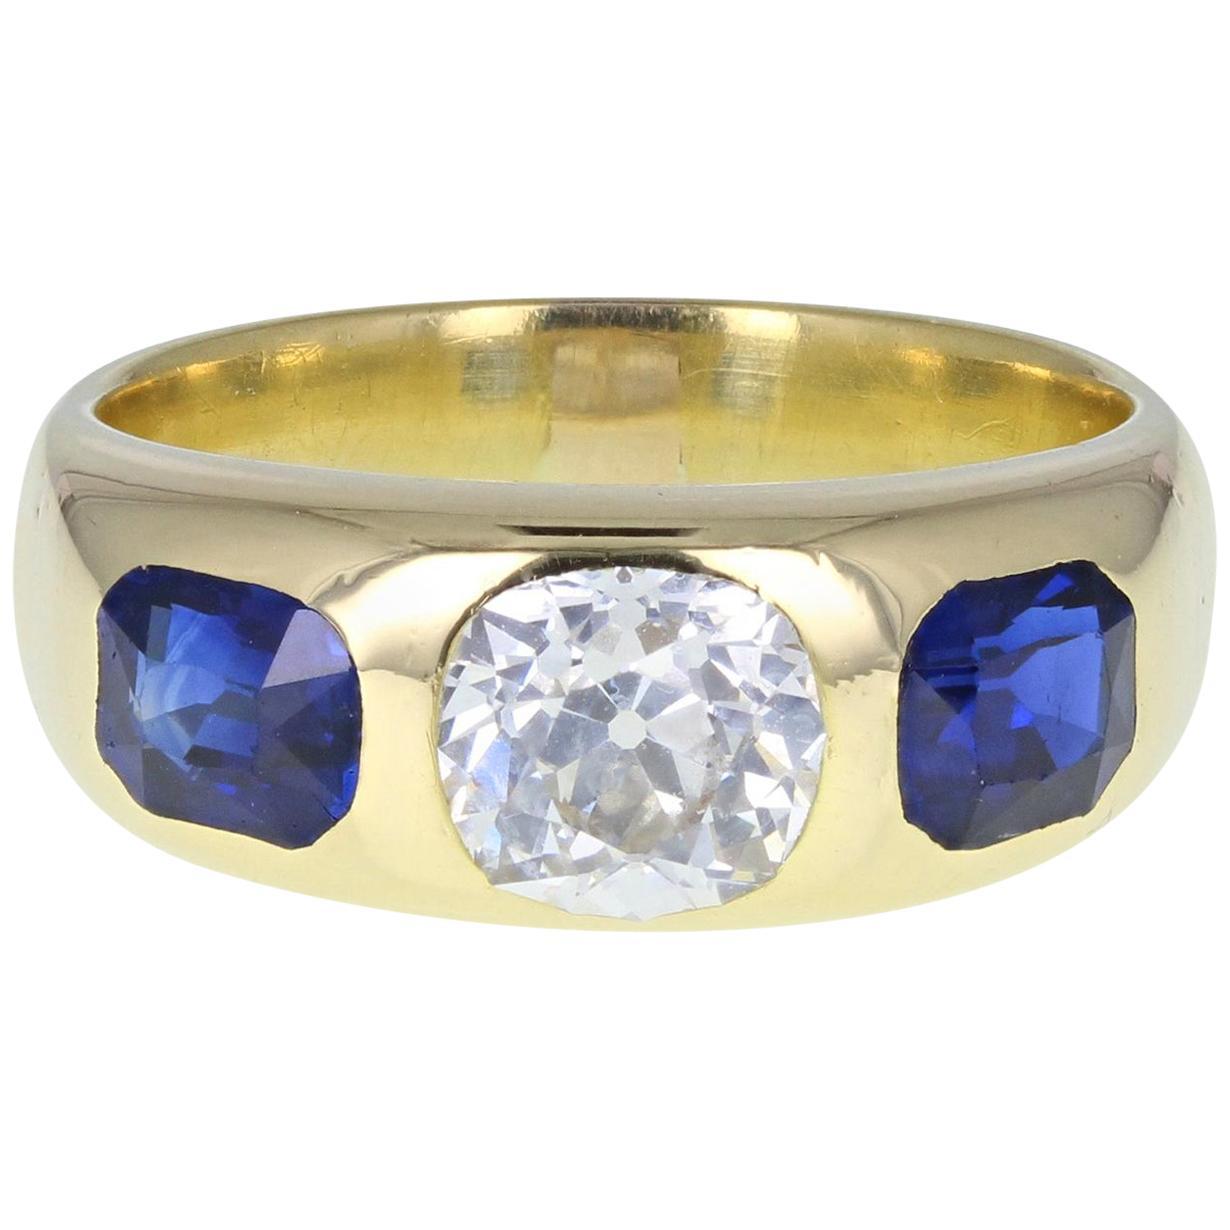 18 Carat Gold Old Cut Diamond Blue Sapphire Three-Stone Heavy Band Ring